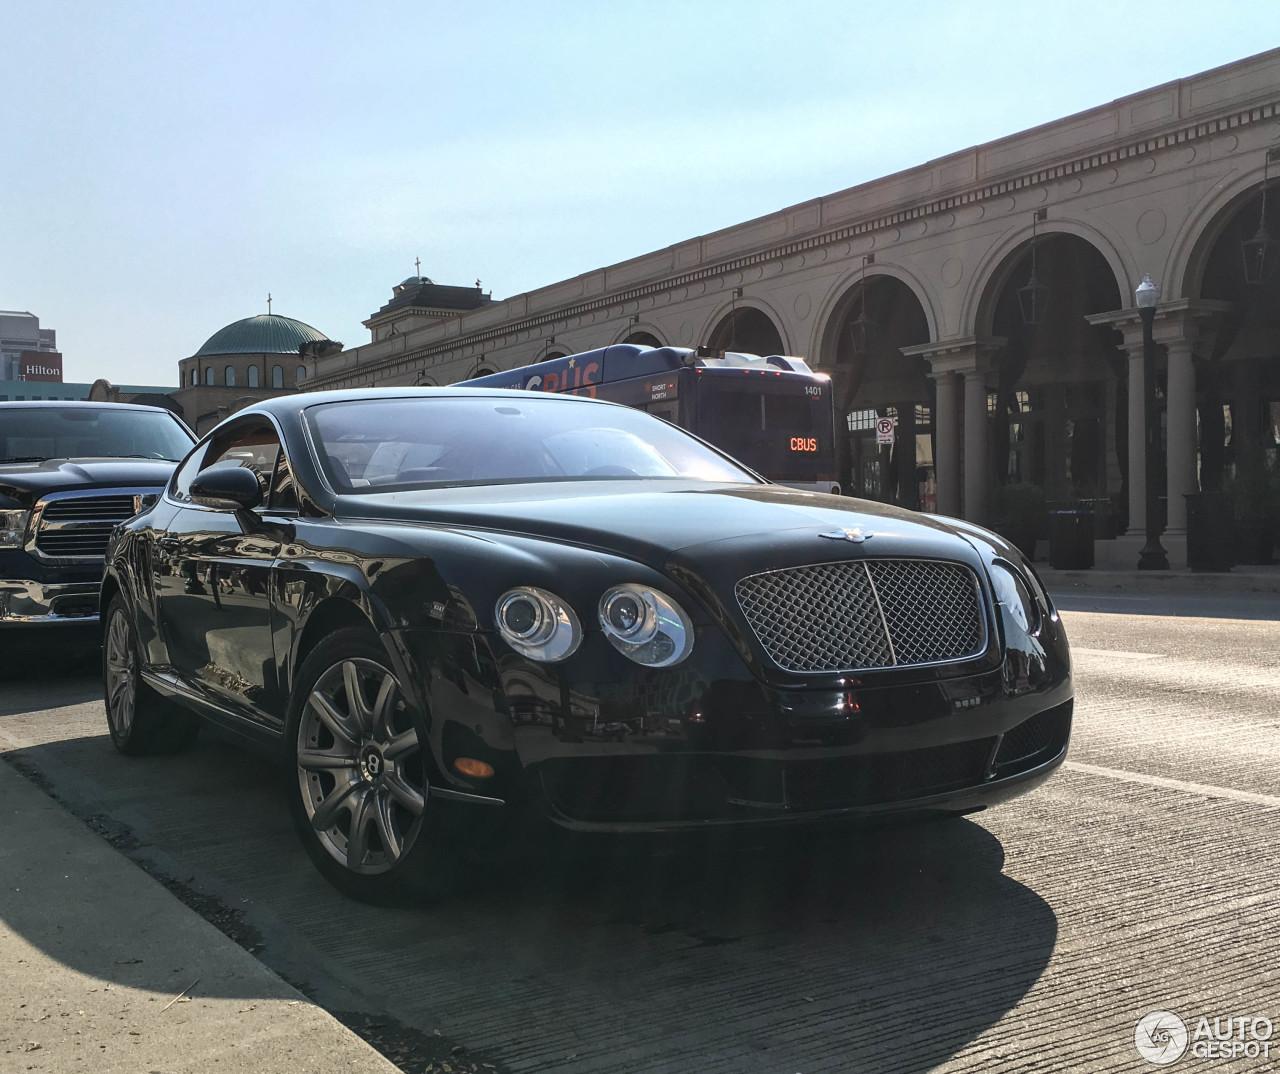 Bentley Continental Gtc Cabriolet 6 0 W12 2013 Supersport: Bentley Continental GT